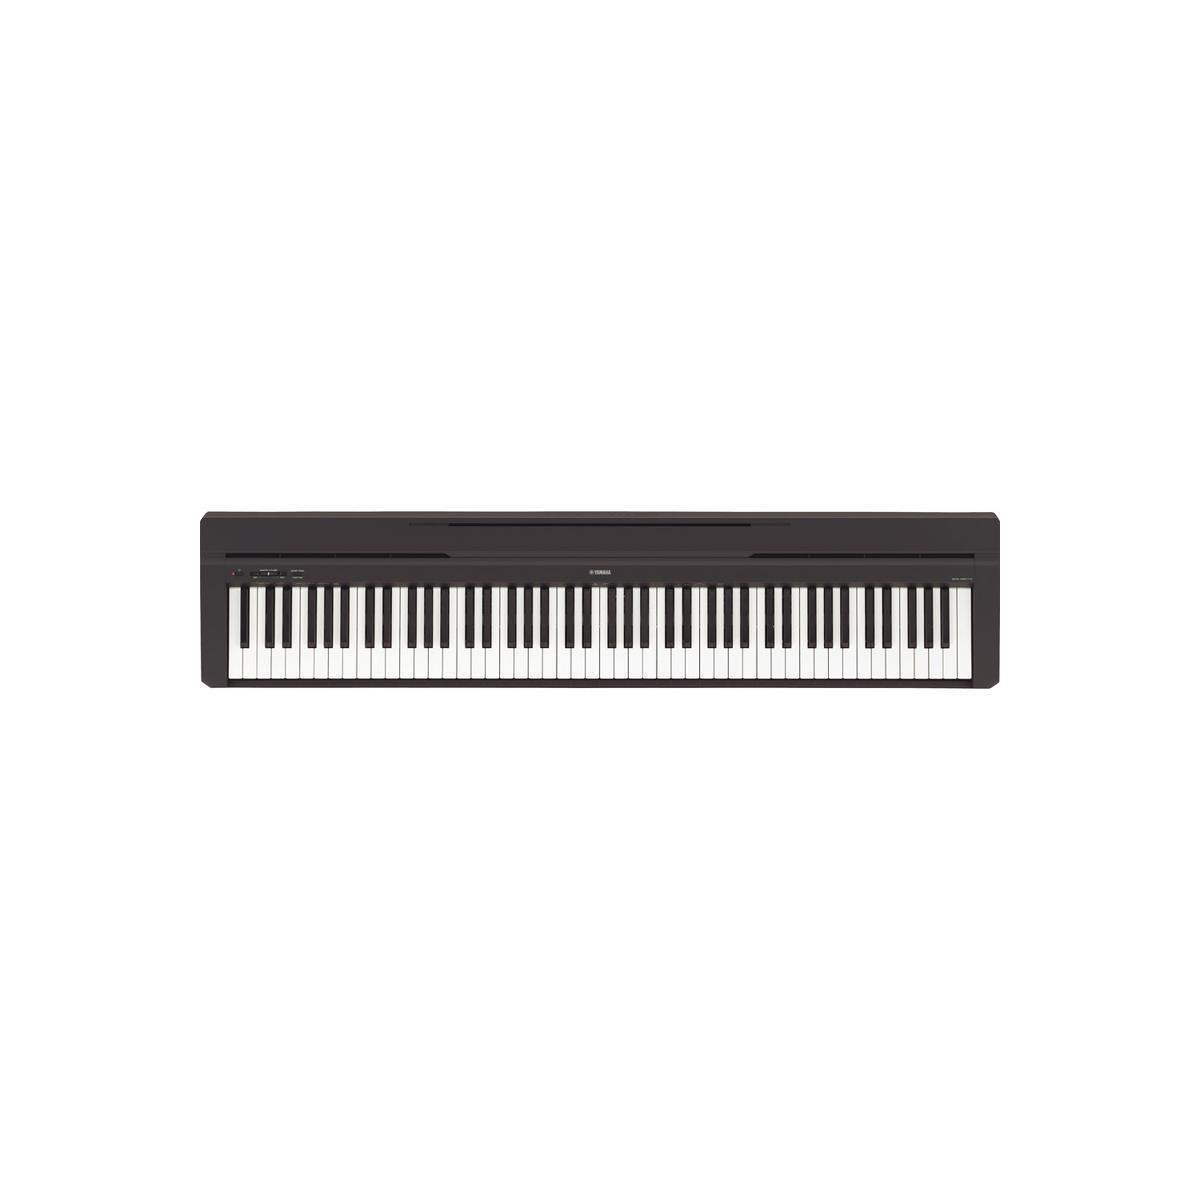 Yamaha p 45 88 key digital piano page 2 for Yamaha 88 key digital piano costco